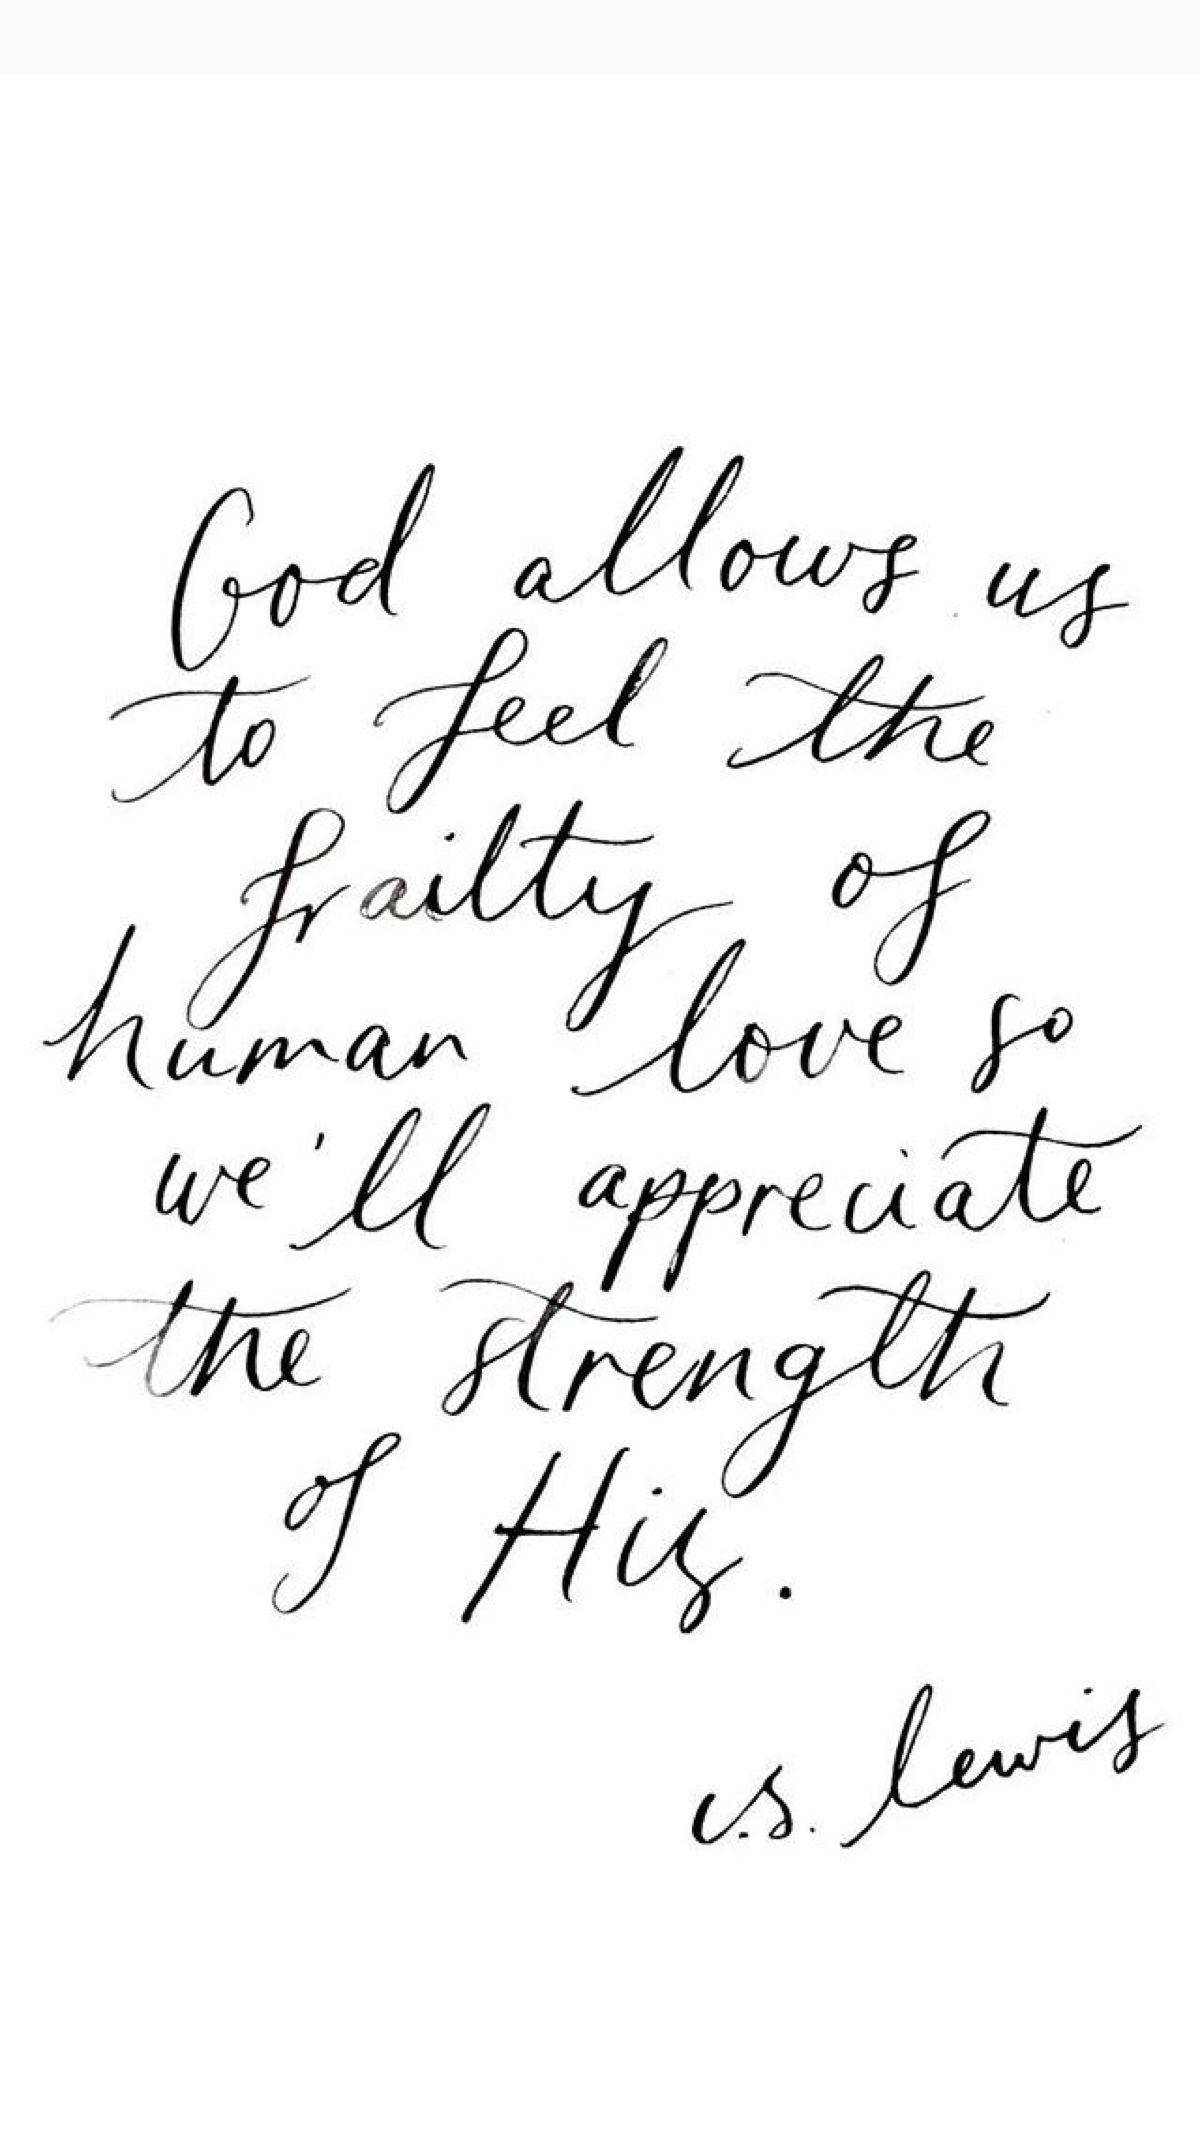 Cs Lewis Quotes On Love I Love This  Ldsgospel  Pinterest  Truths Wisdom And